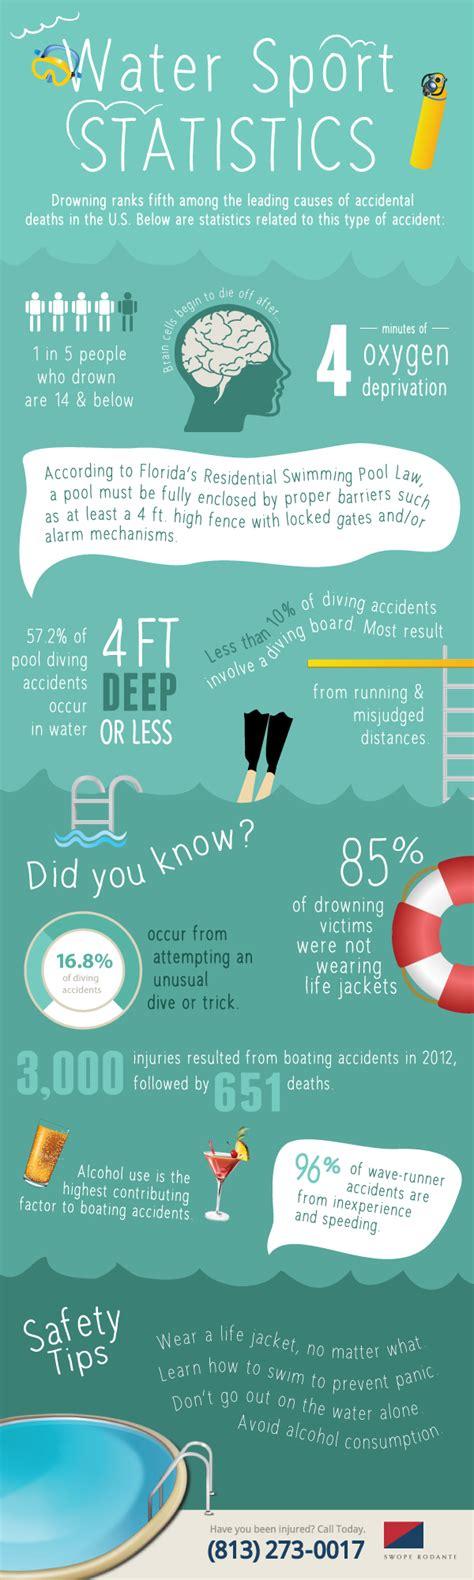 Backyard Pool Drowning Statistics Pools And Diving Injury Statistics Infographic